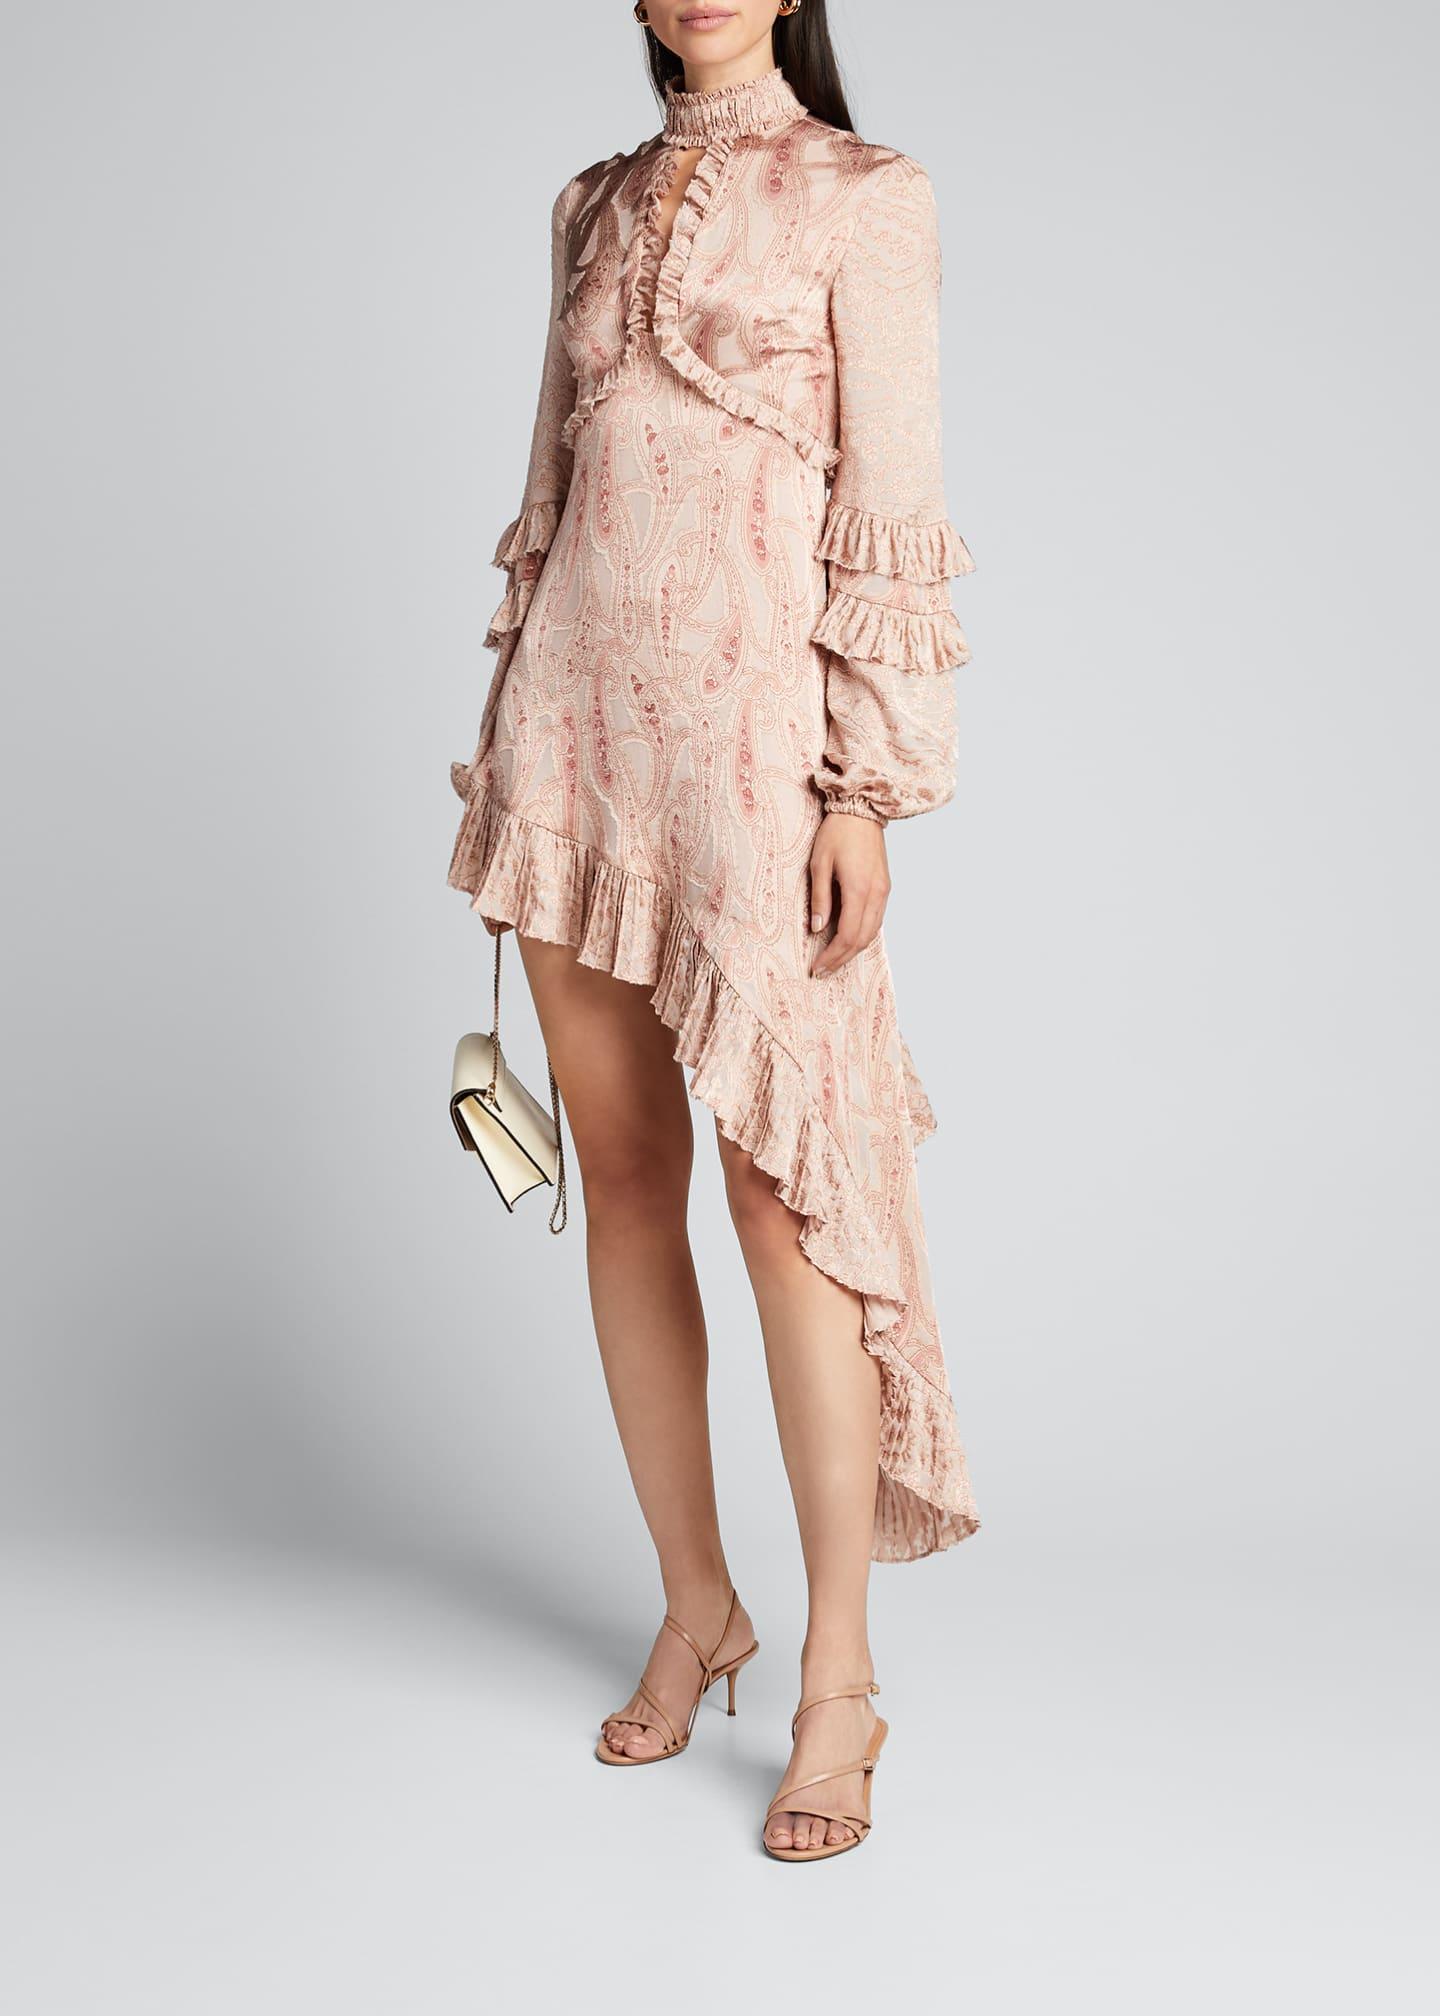 Alexis Liora Asymmetric Paisley Ruffle Dress